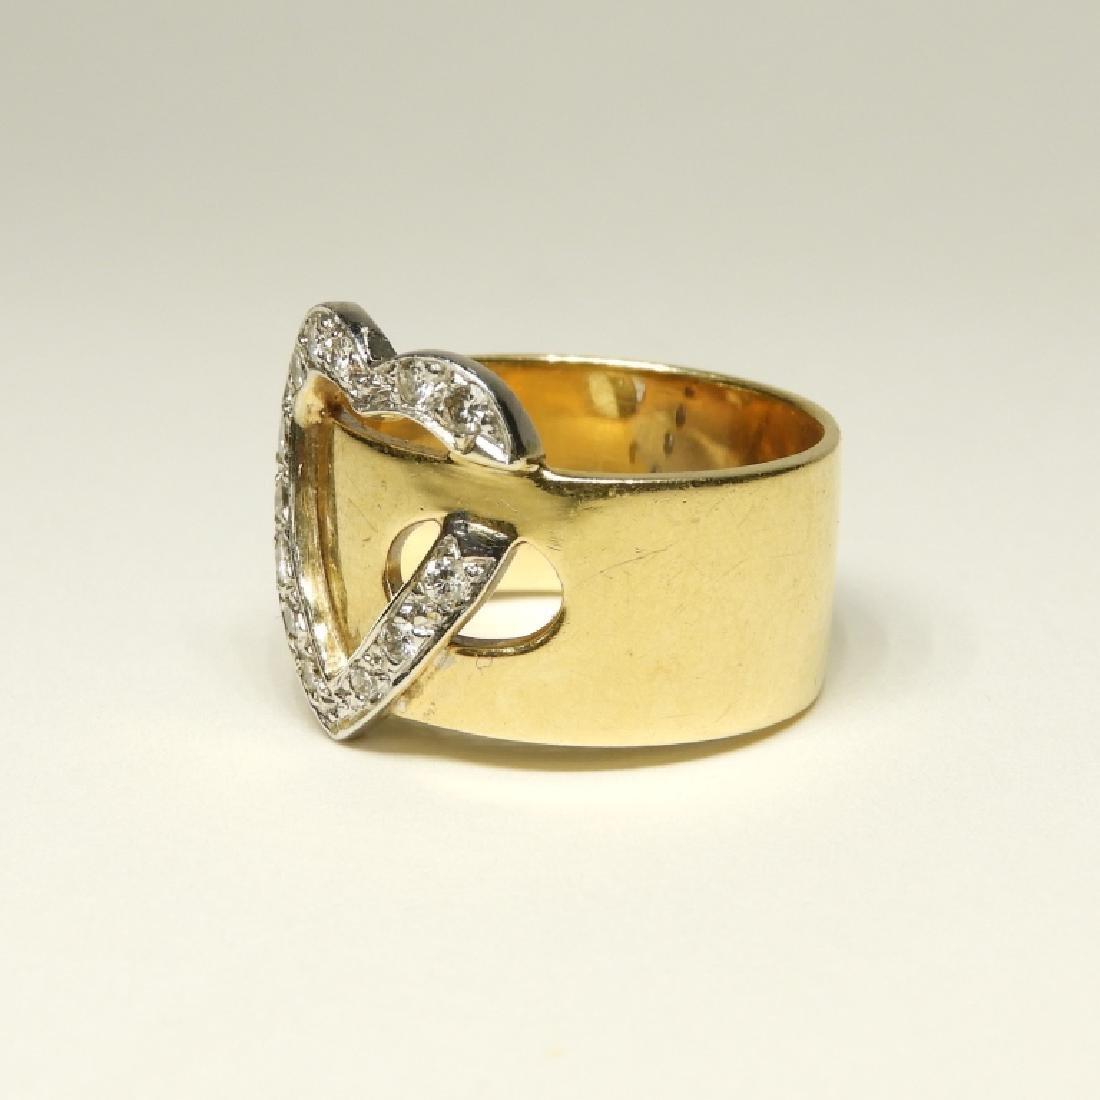 14K Gold Diamond Heart Belt Form Lady's Ring - 2